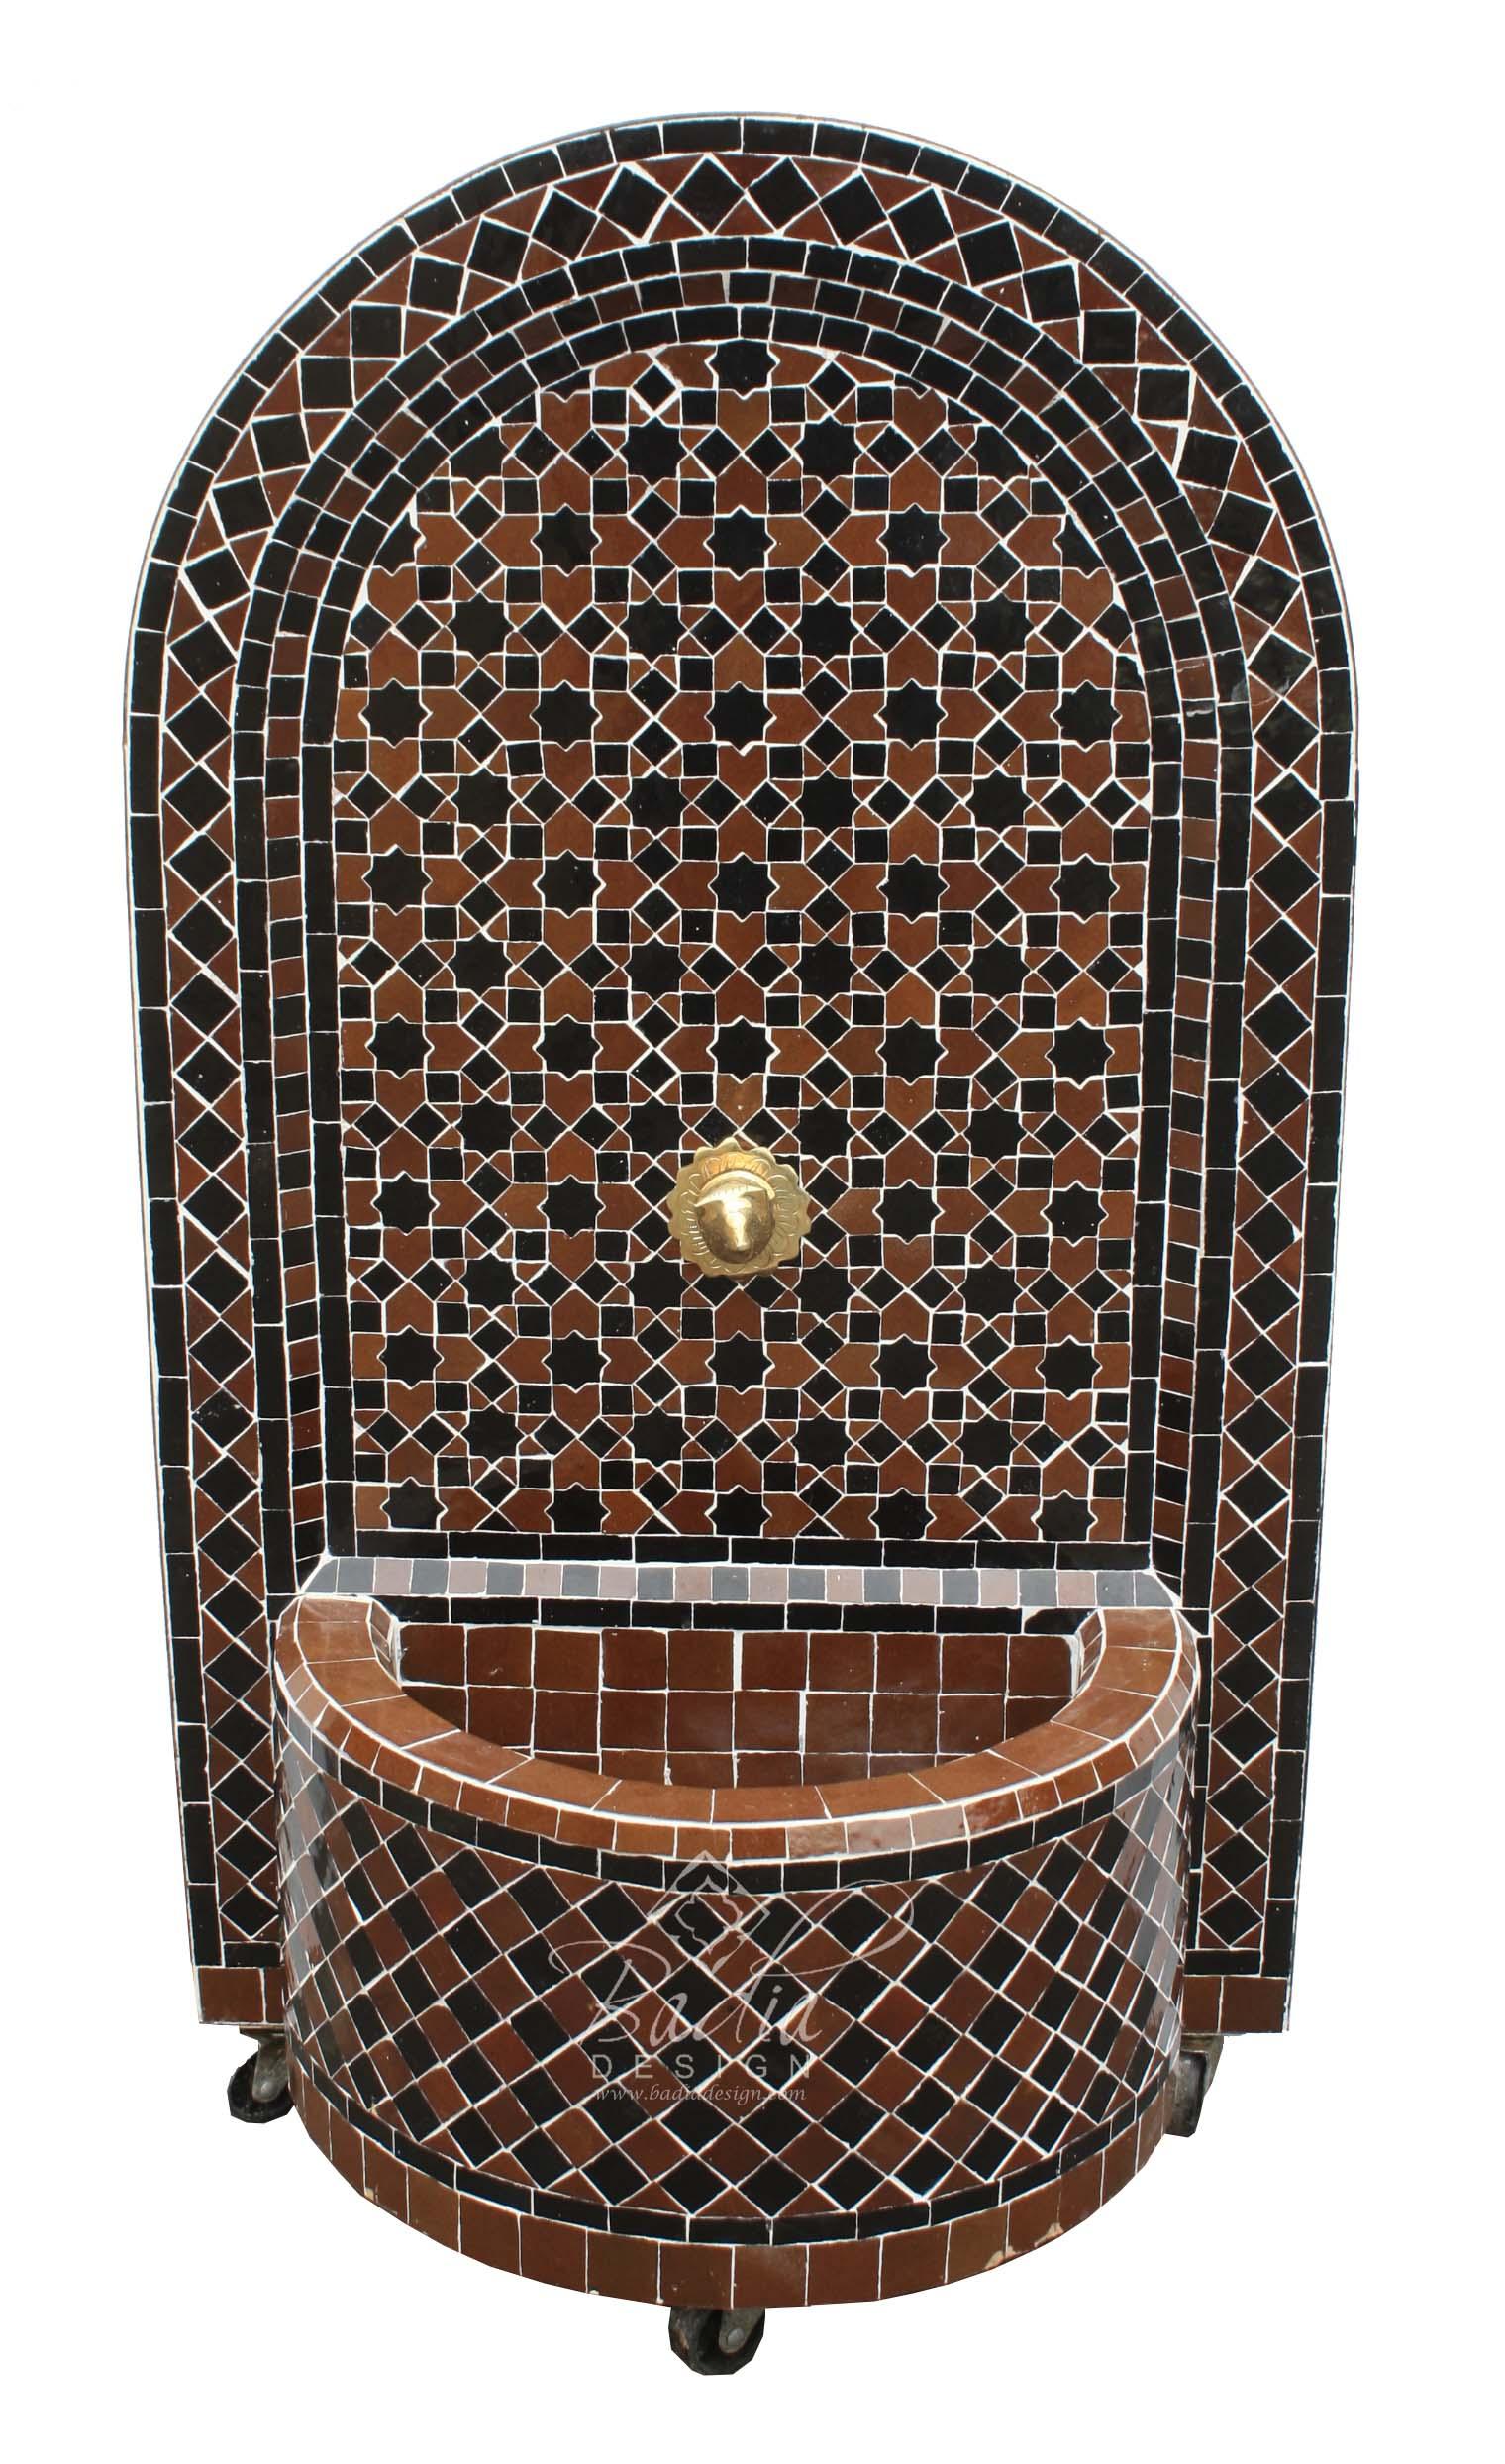 moroccan-mosaic-tile-water-fountain-mf664-1.jpg